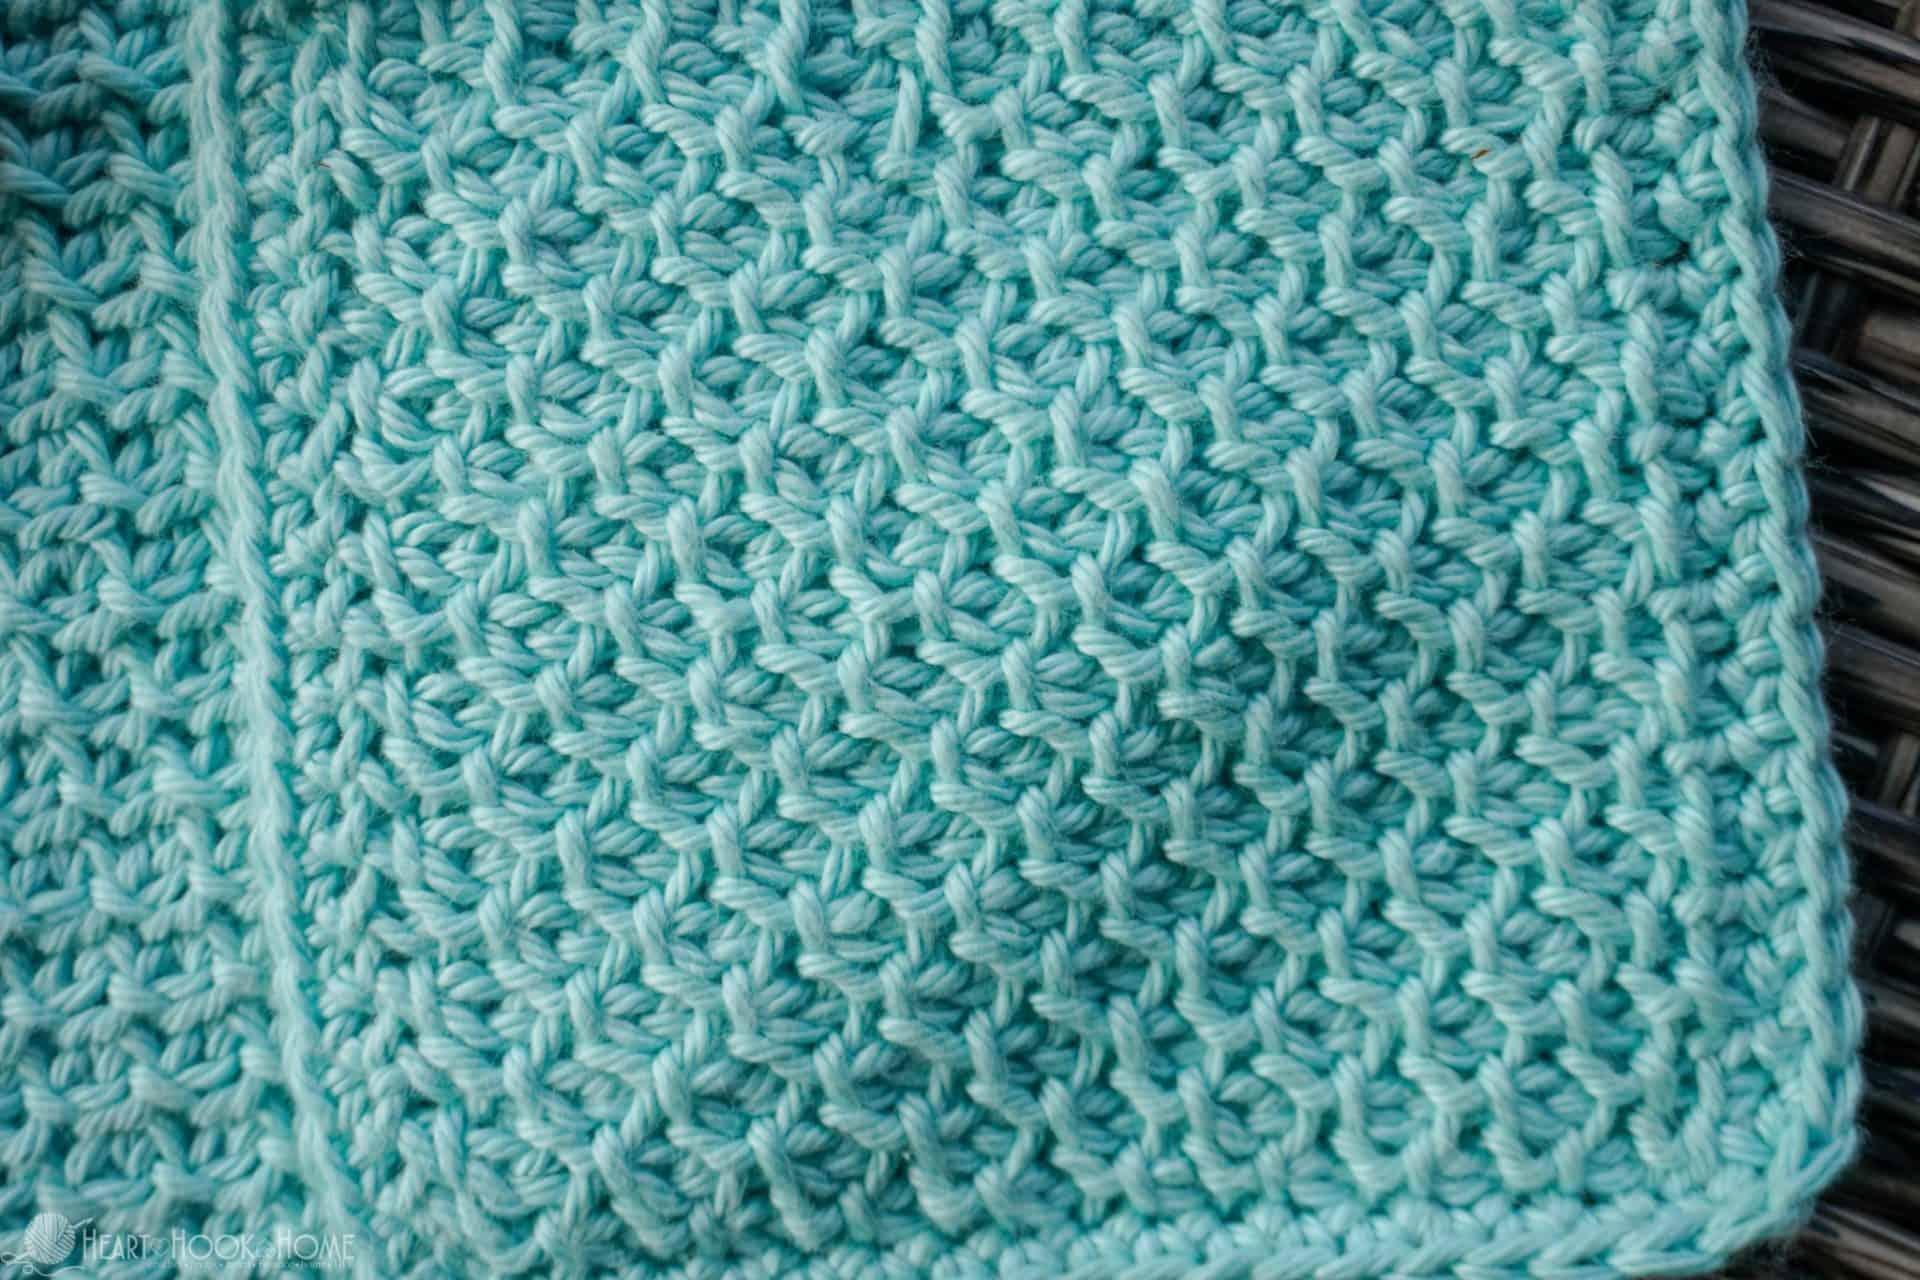 Tunisian Honeycomb Crochet Stitch Tutorial